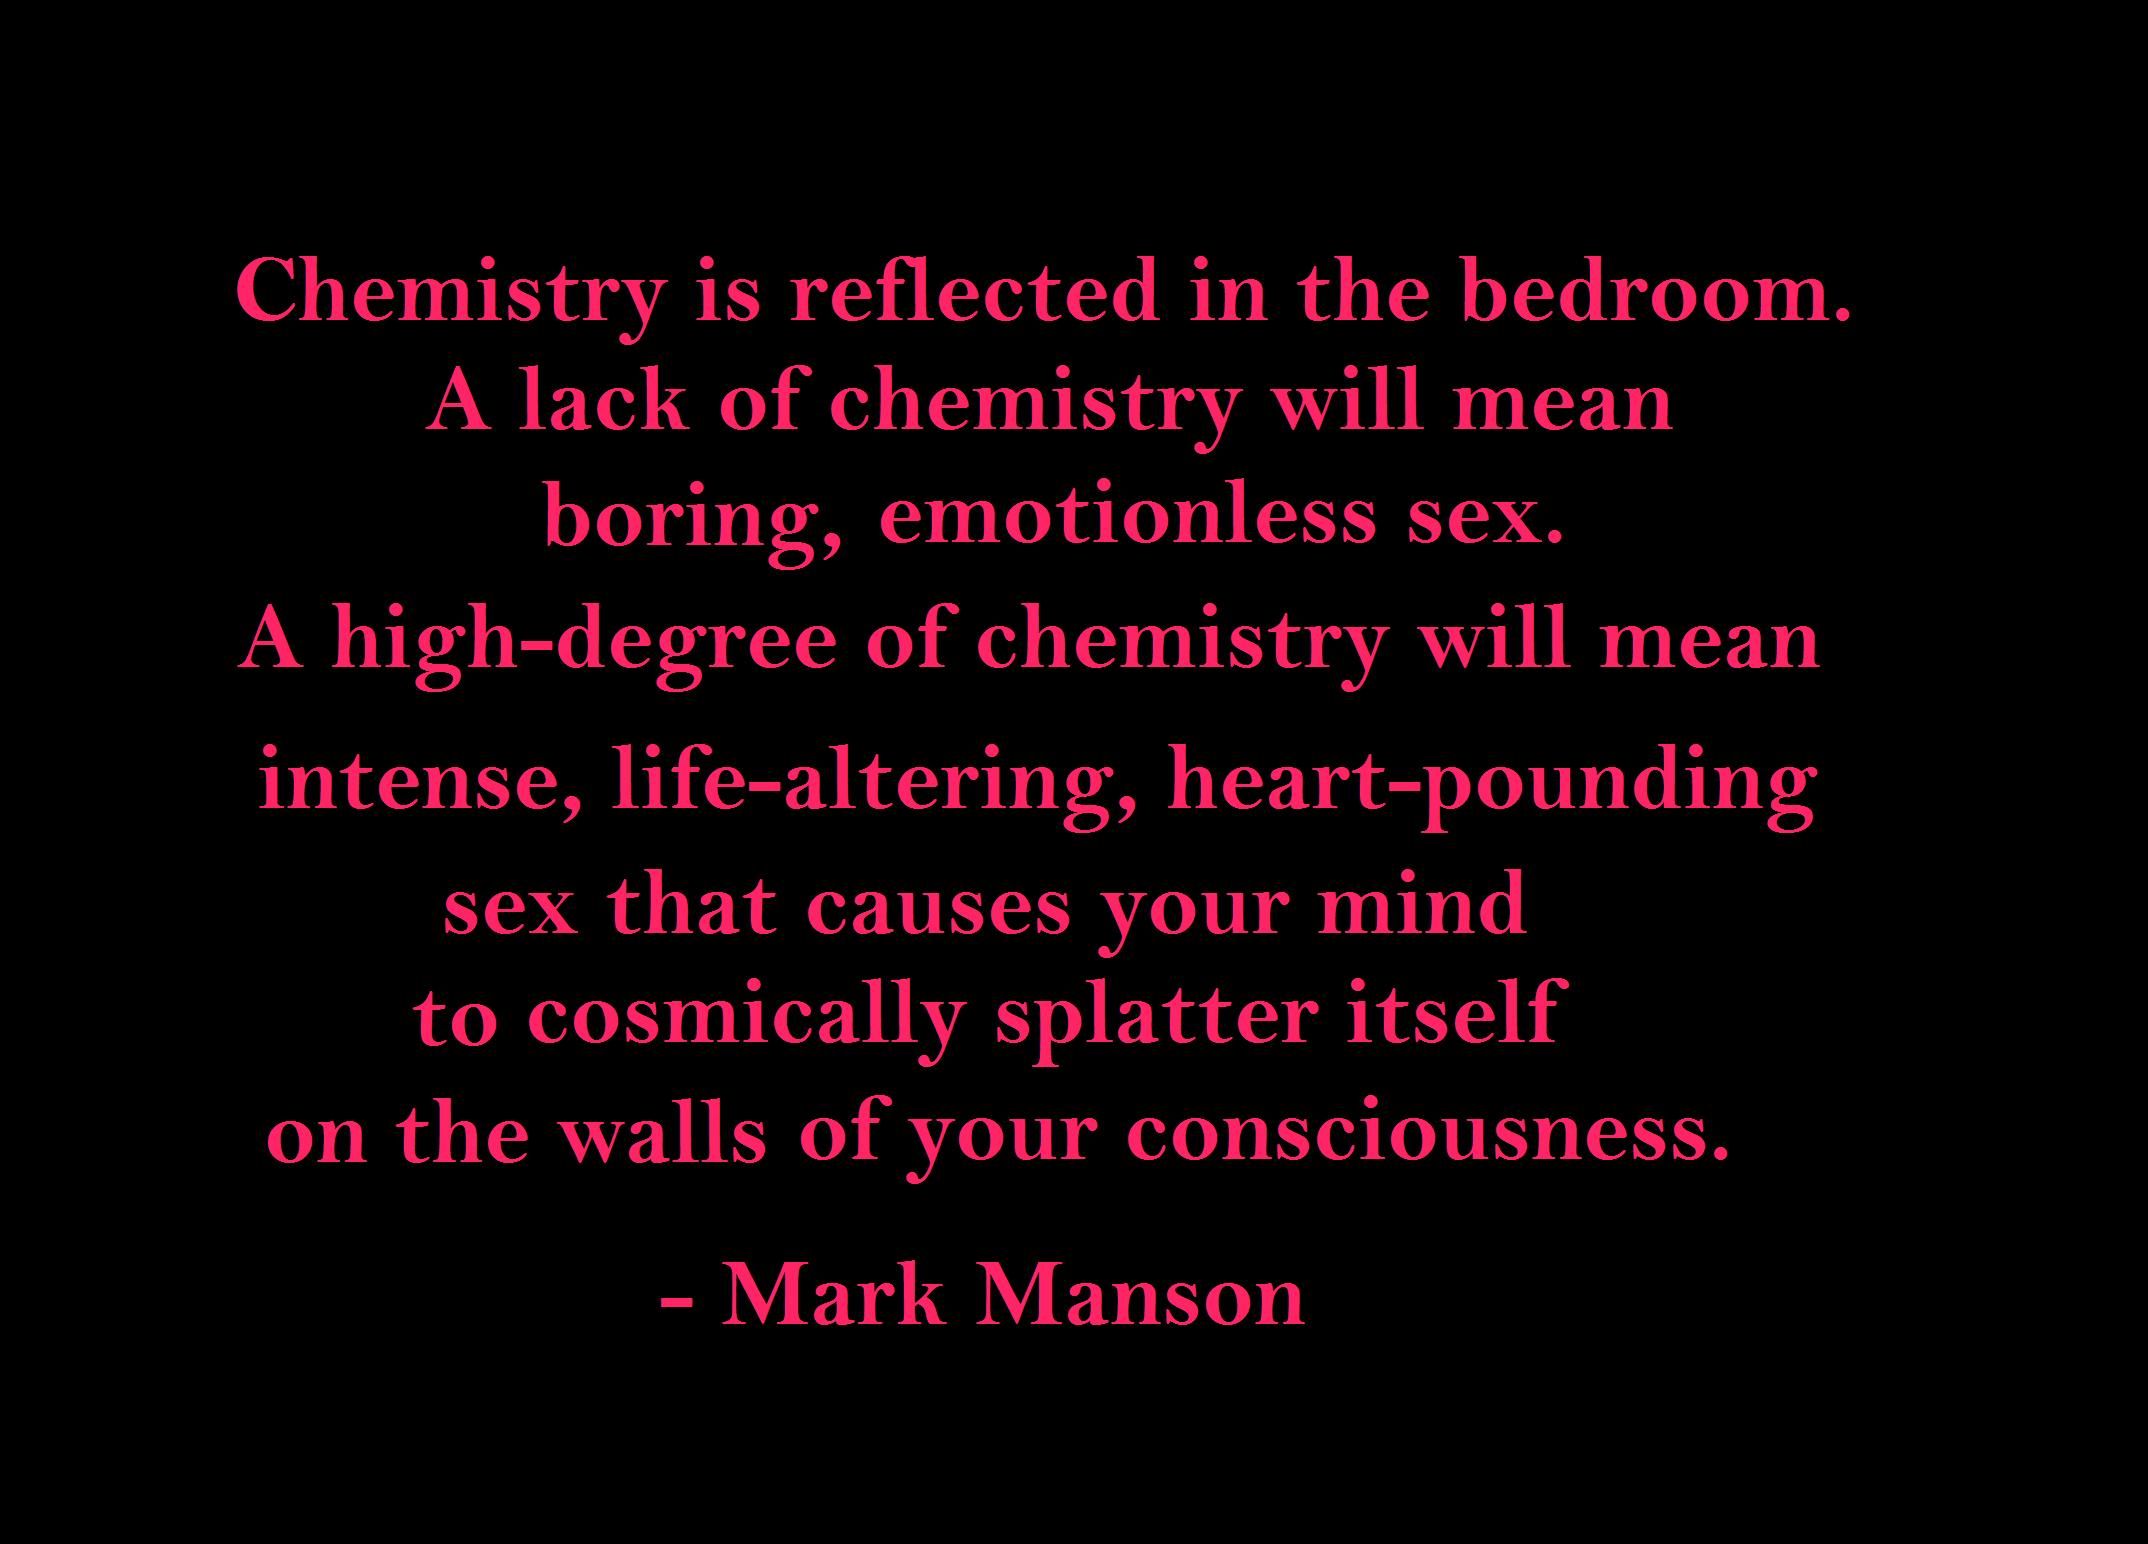 Chemistry relationship - Wikipedia